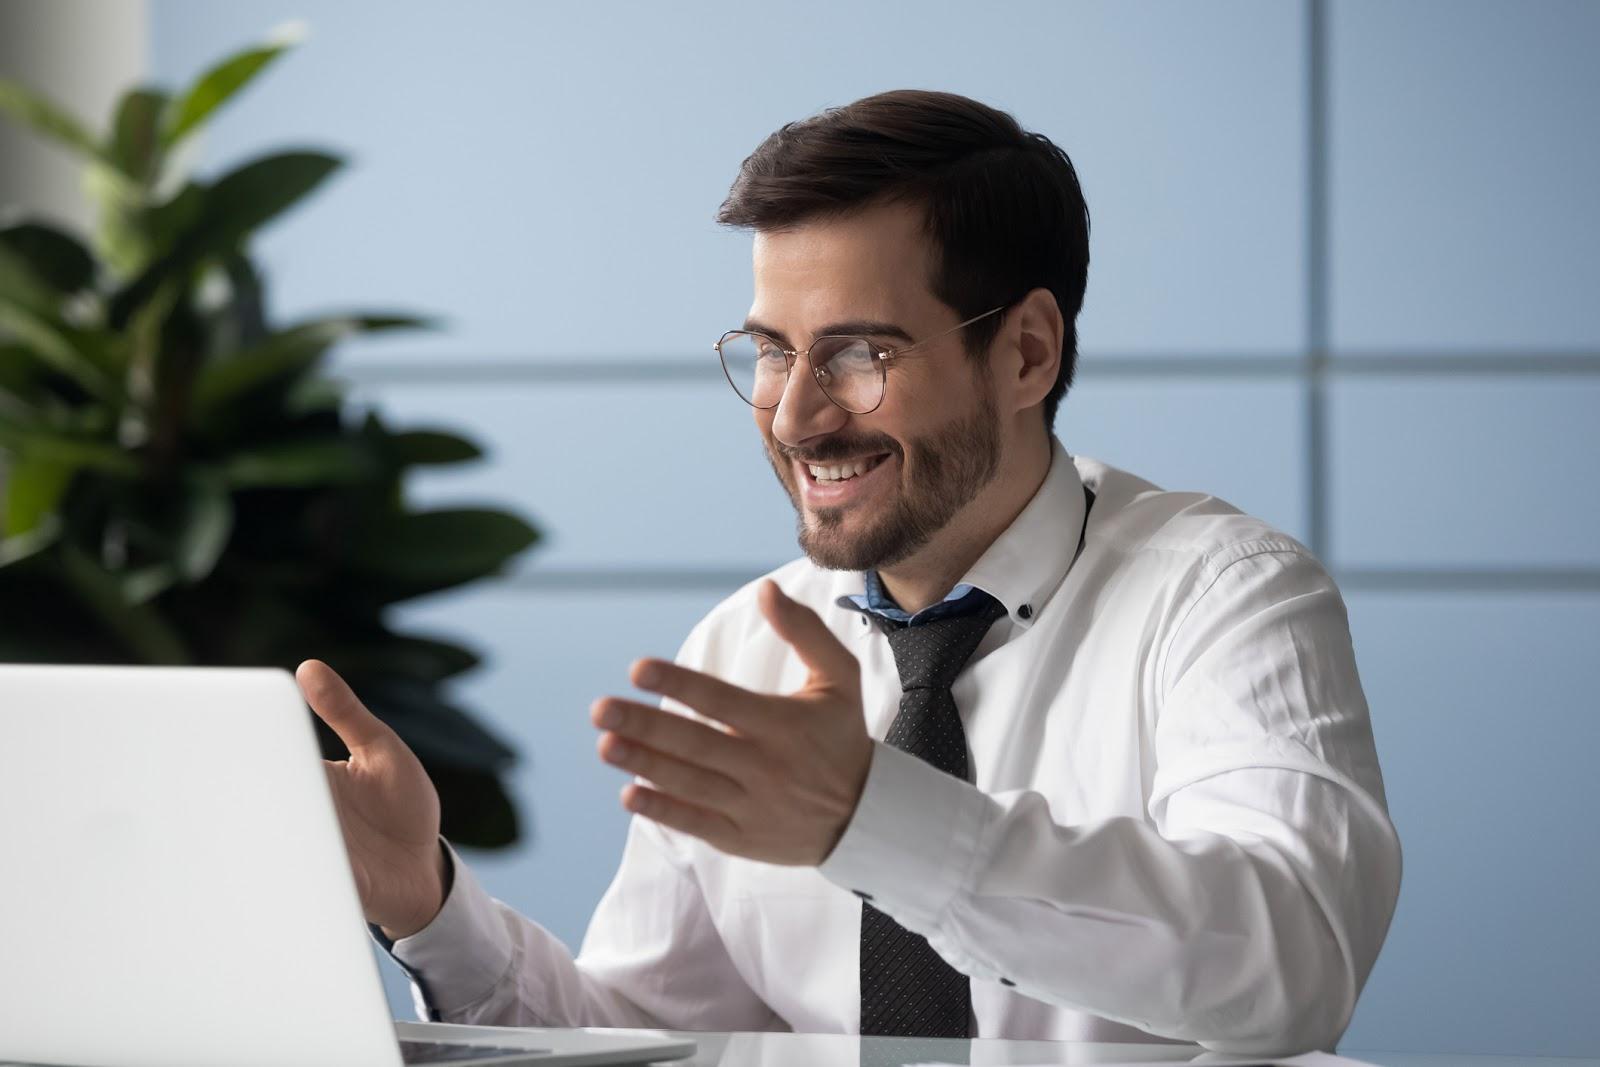 man speaking to computer conducting webinar